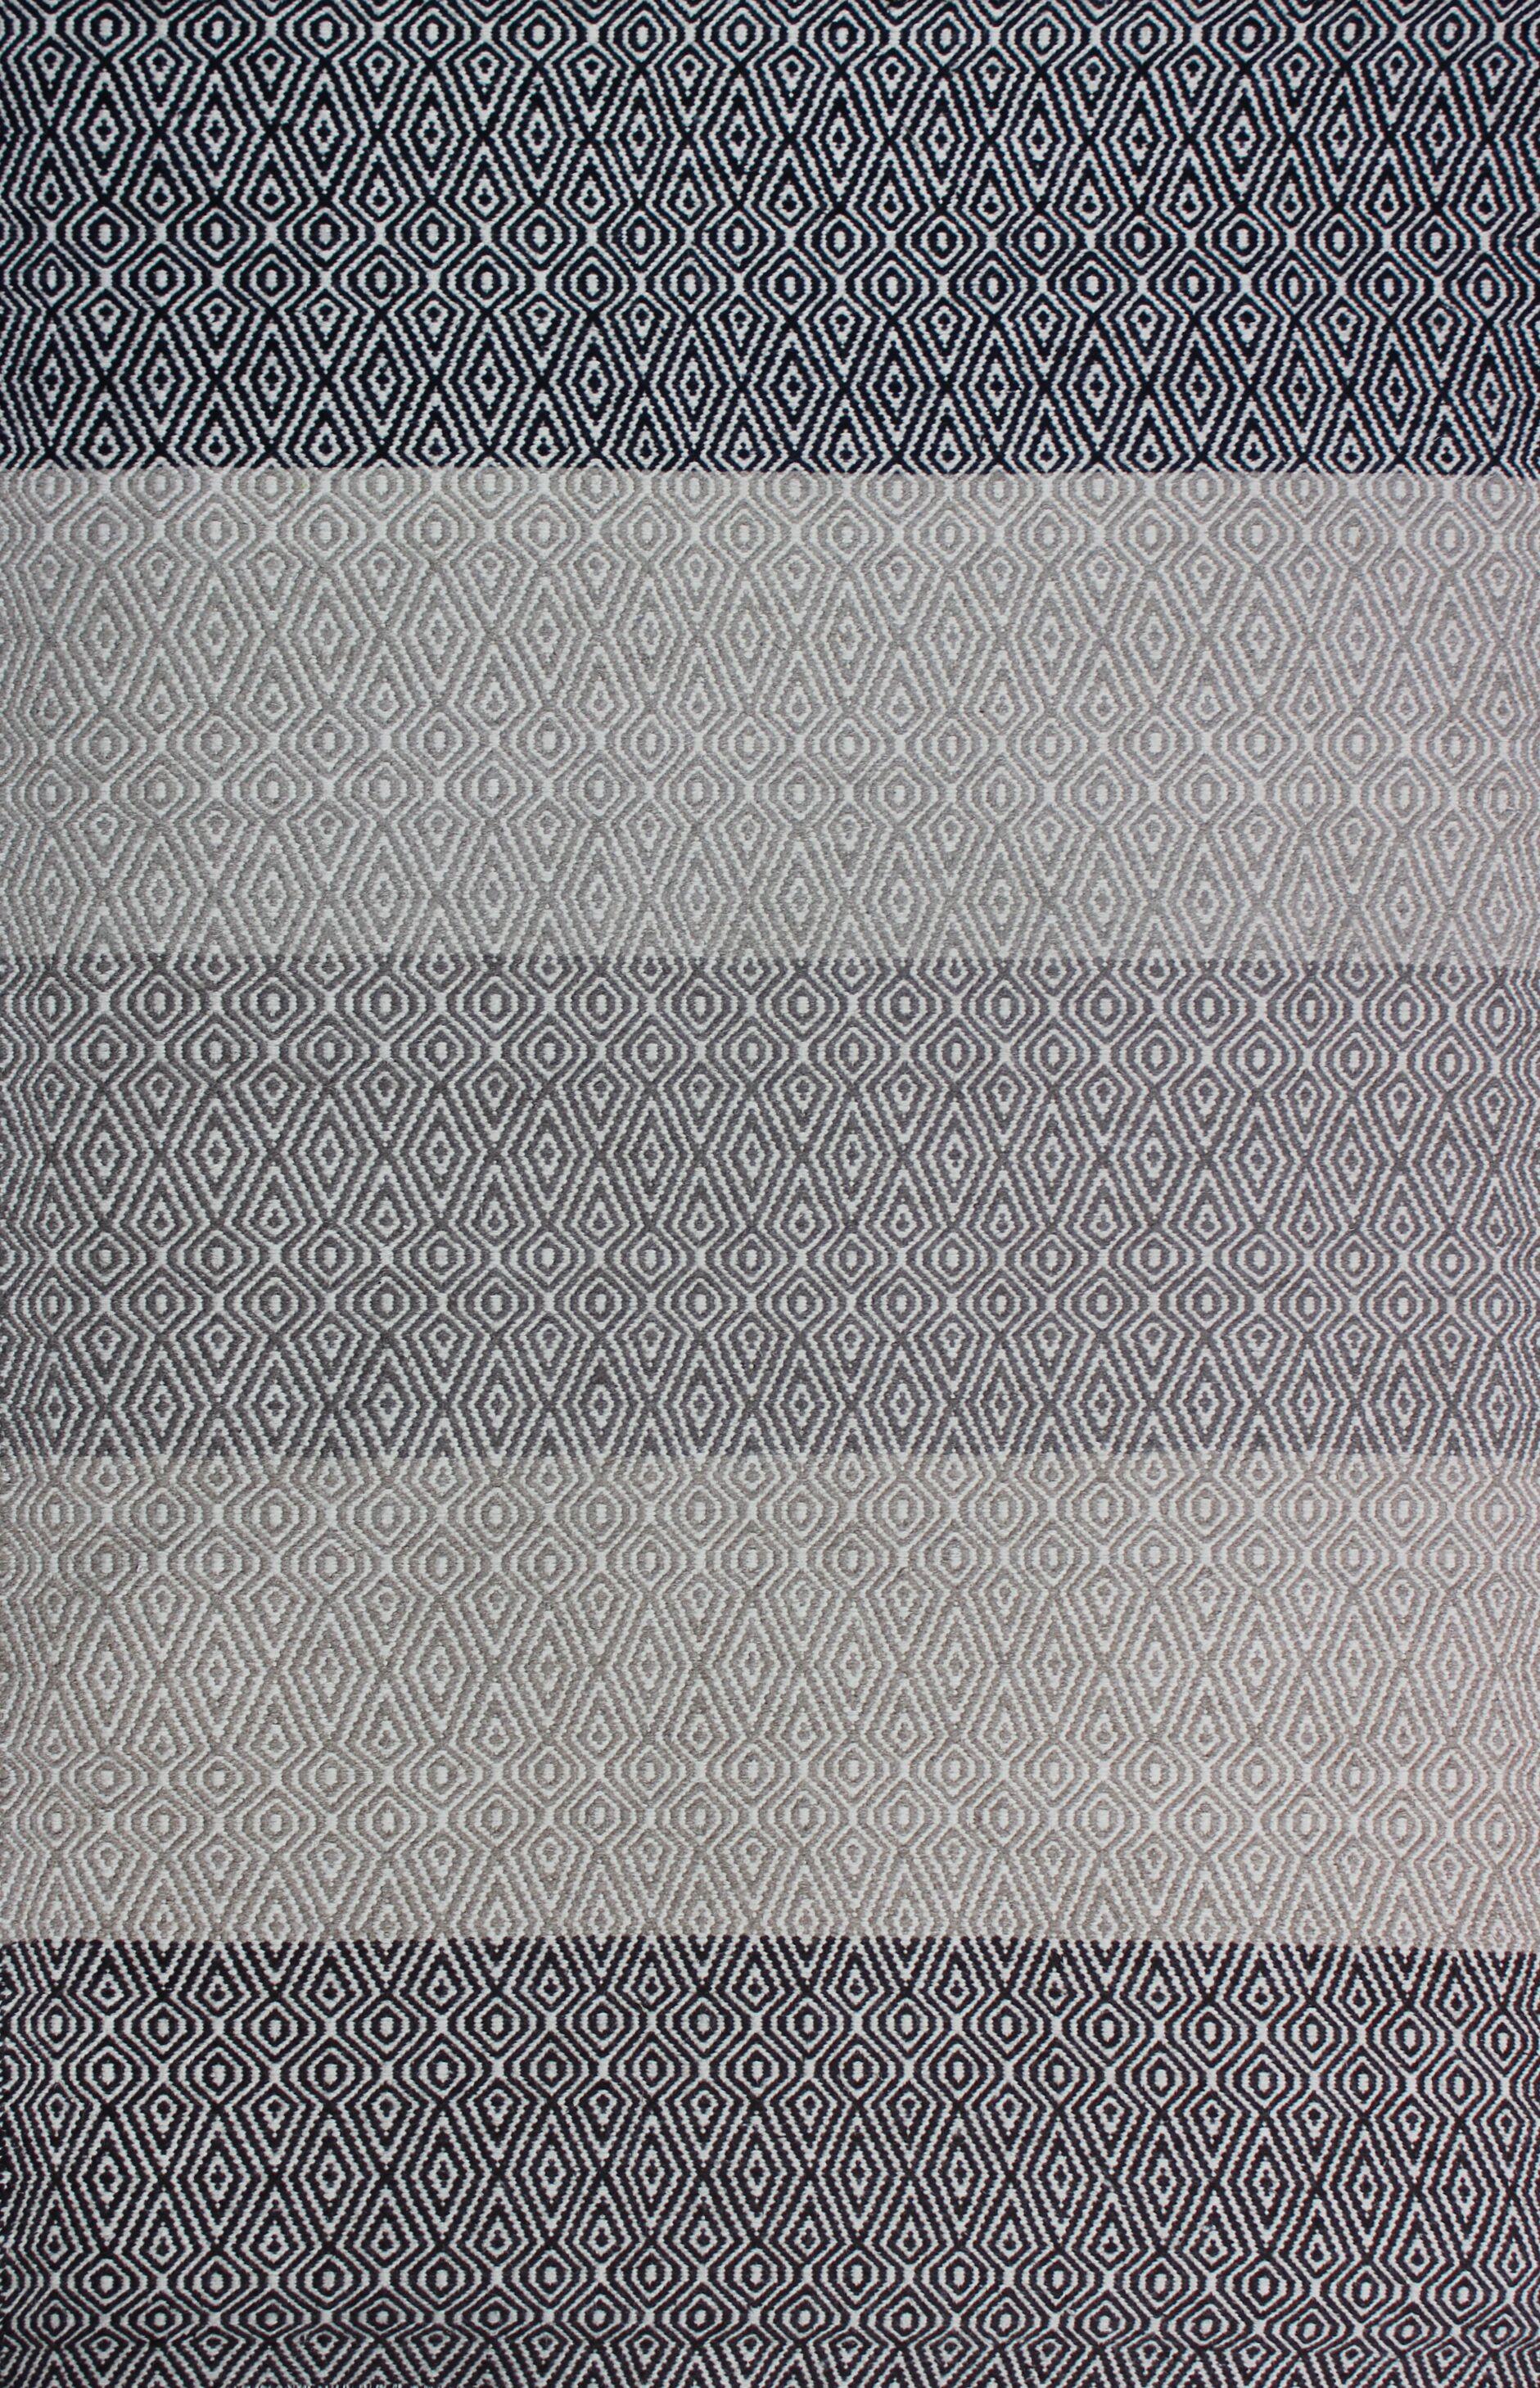 Borja Neutral Area Throw Rug Rug Size: Rectangle 5' x 8'